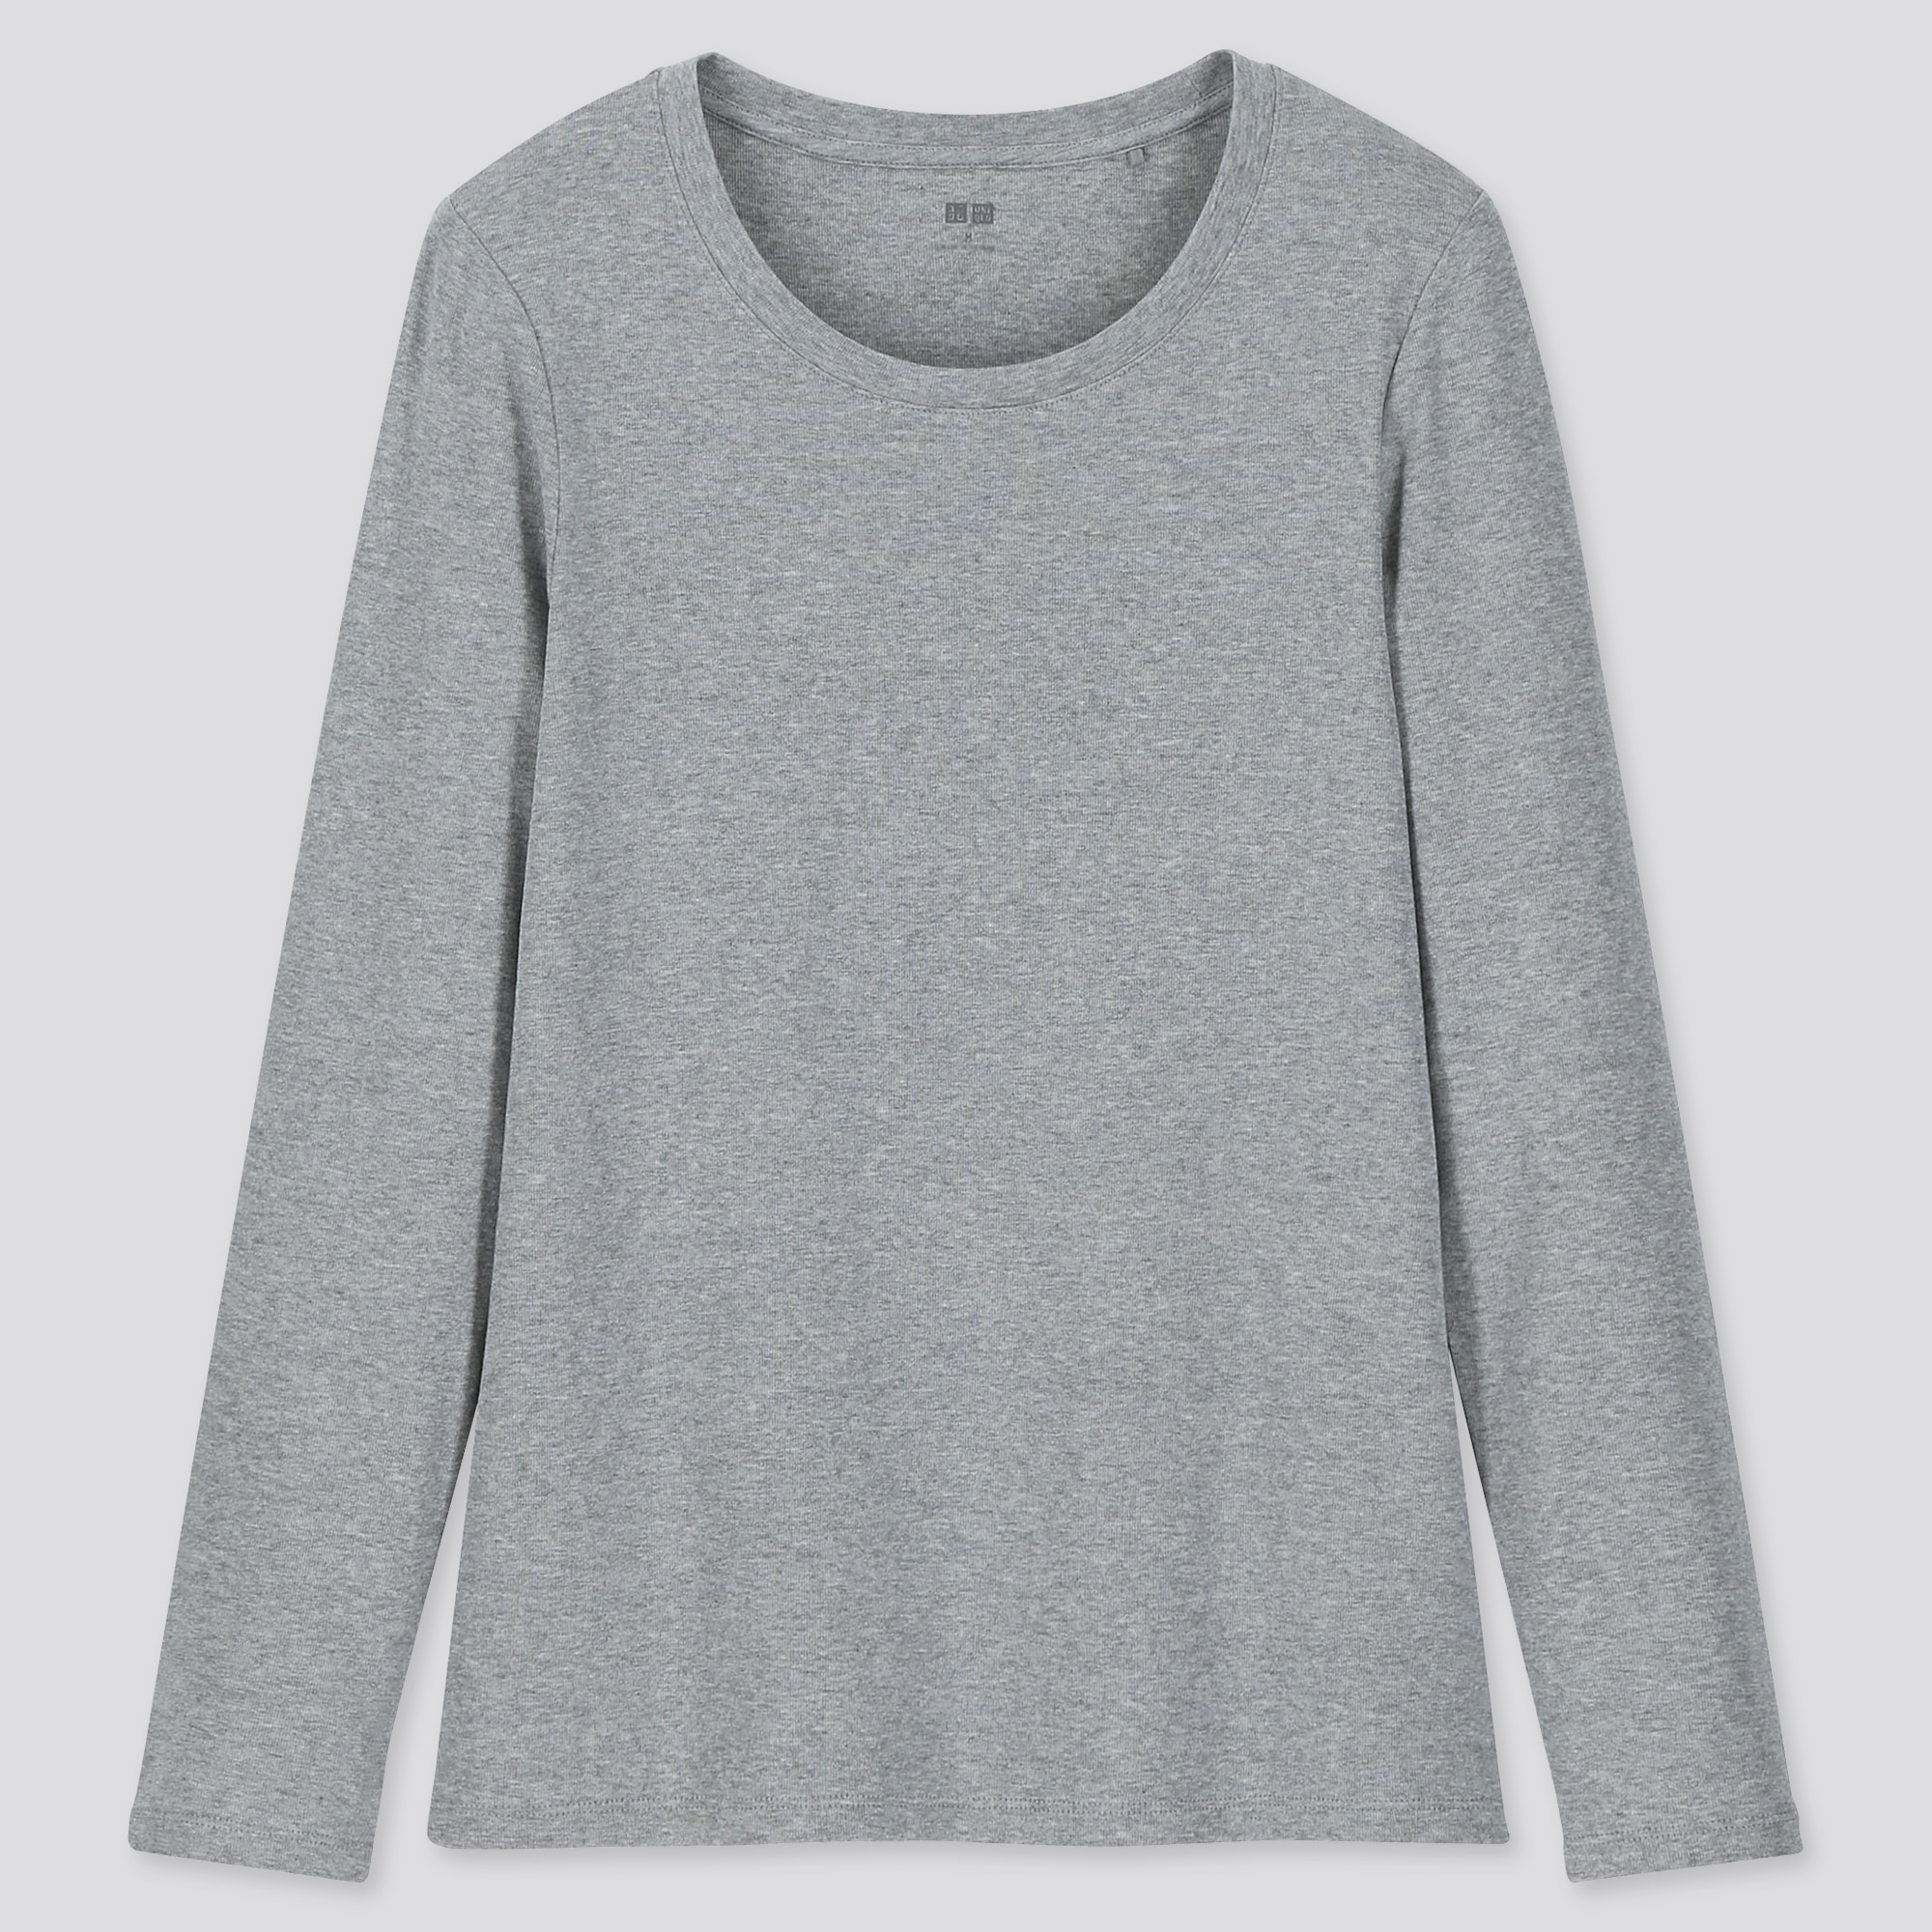 New Gildan Performance Long Sleeve T-Shirt Mens Top Tee Sleeves Shirts Crew Neck